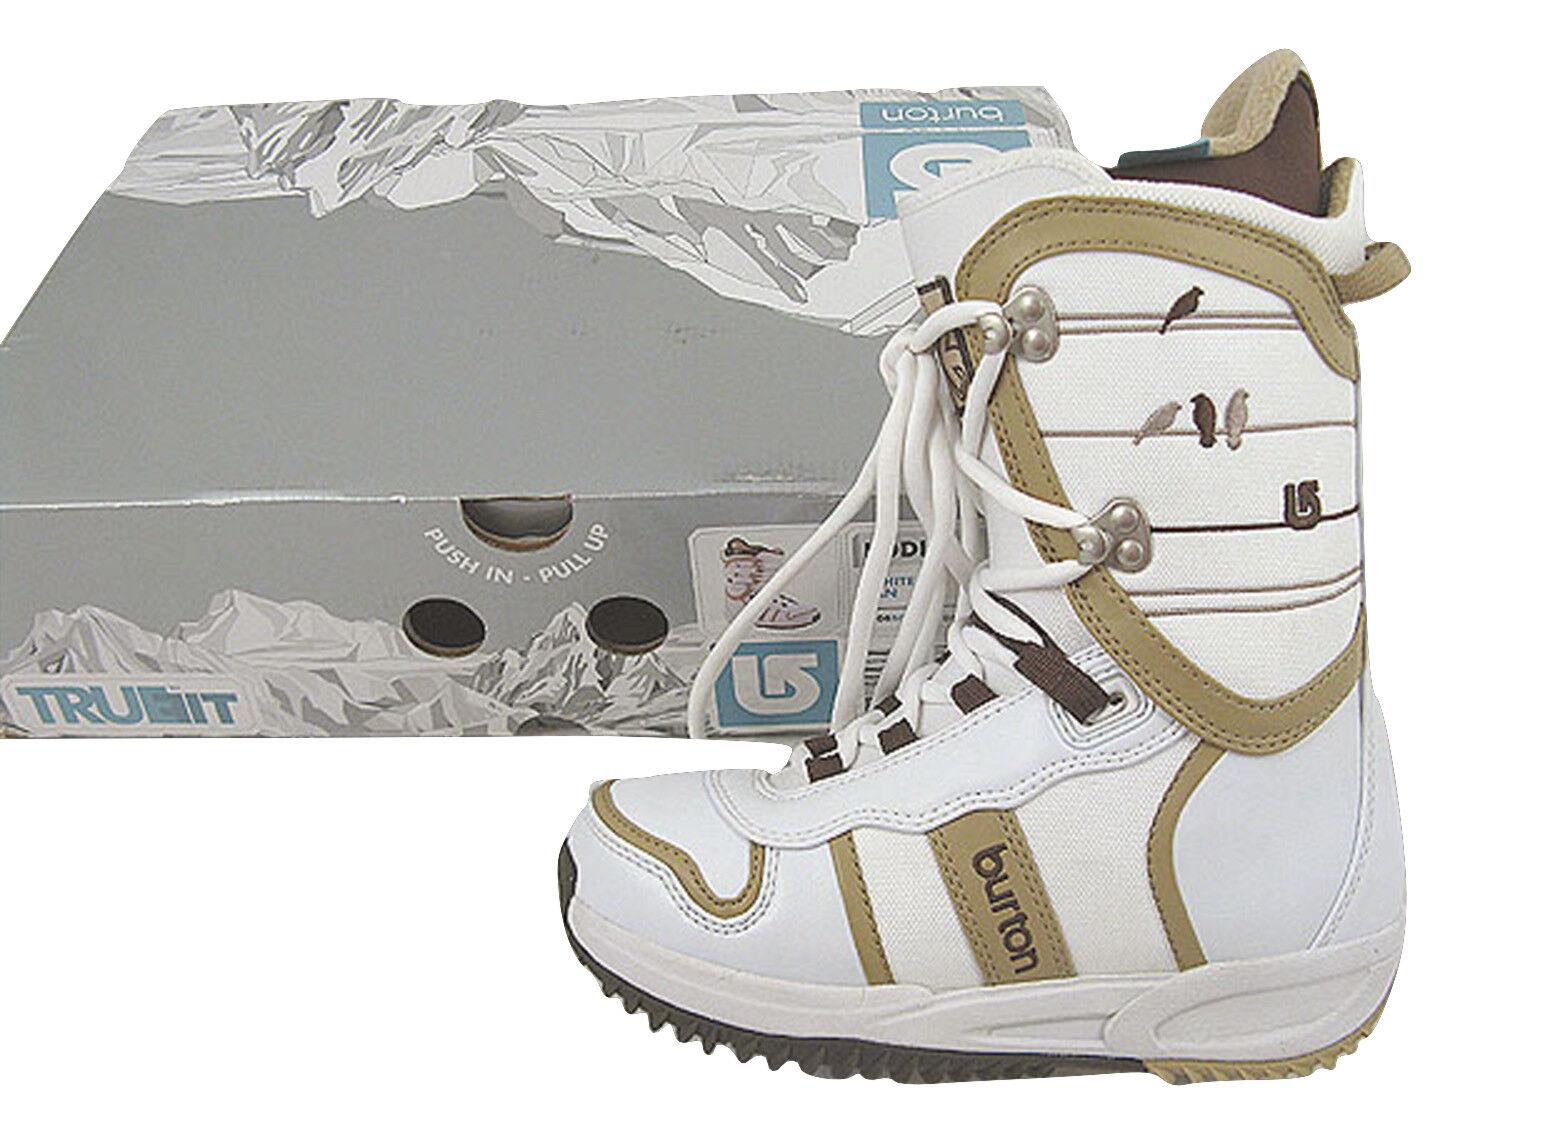 NEW Burton Lodi Snowboard Boots  US 5.5, Euro 36, Mondo 22.5 White Birds